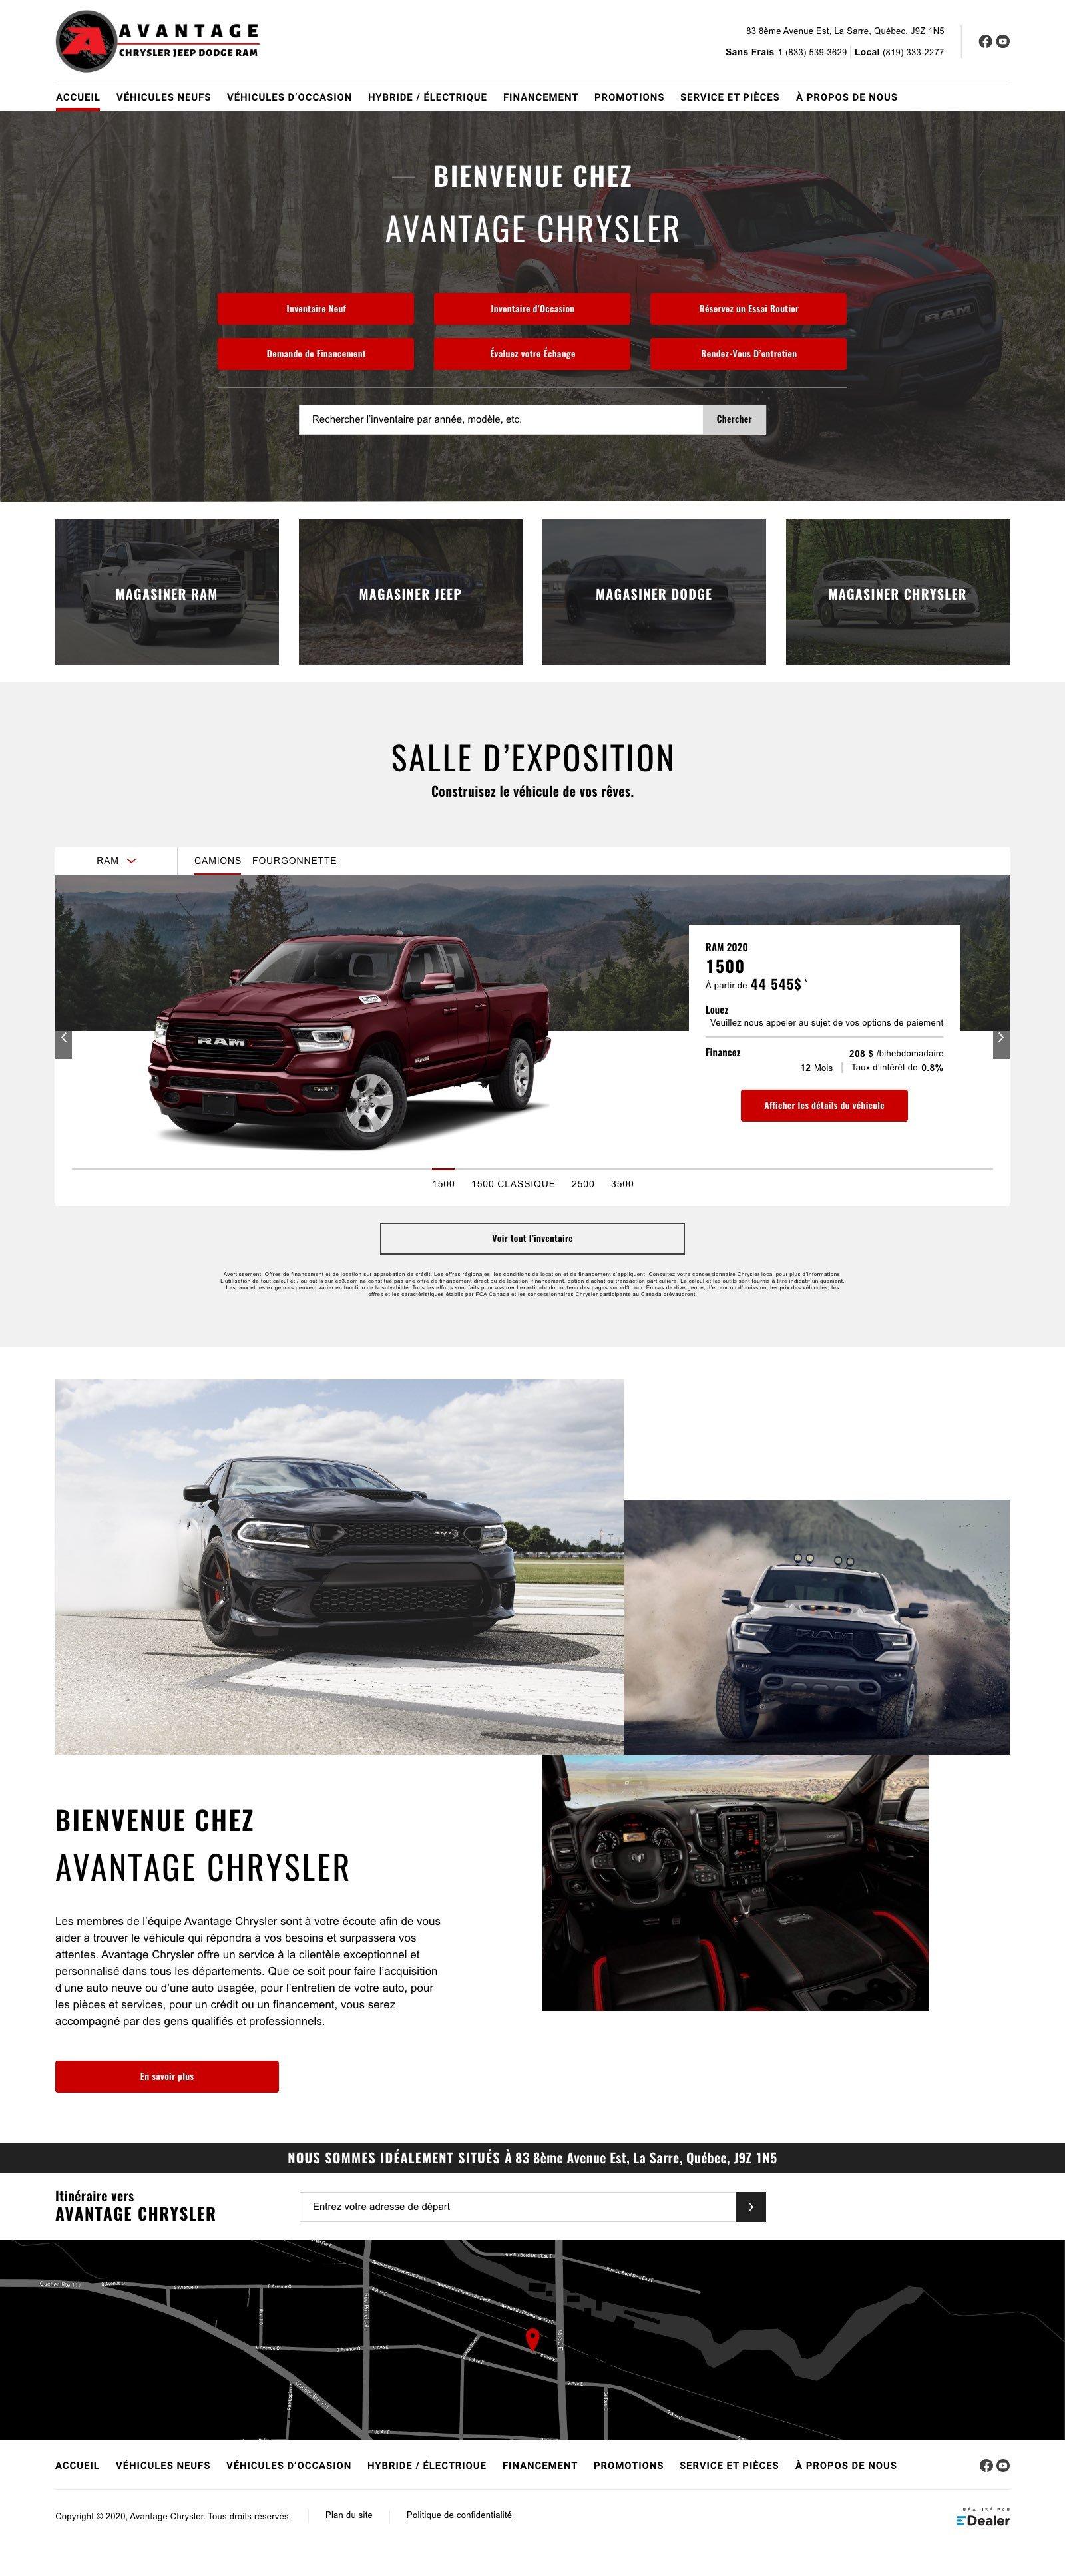 Avantage Chrysler